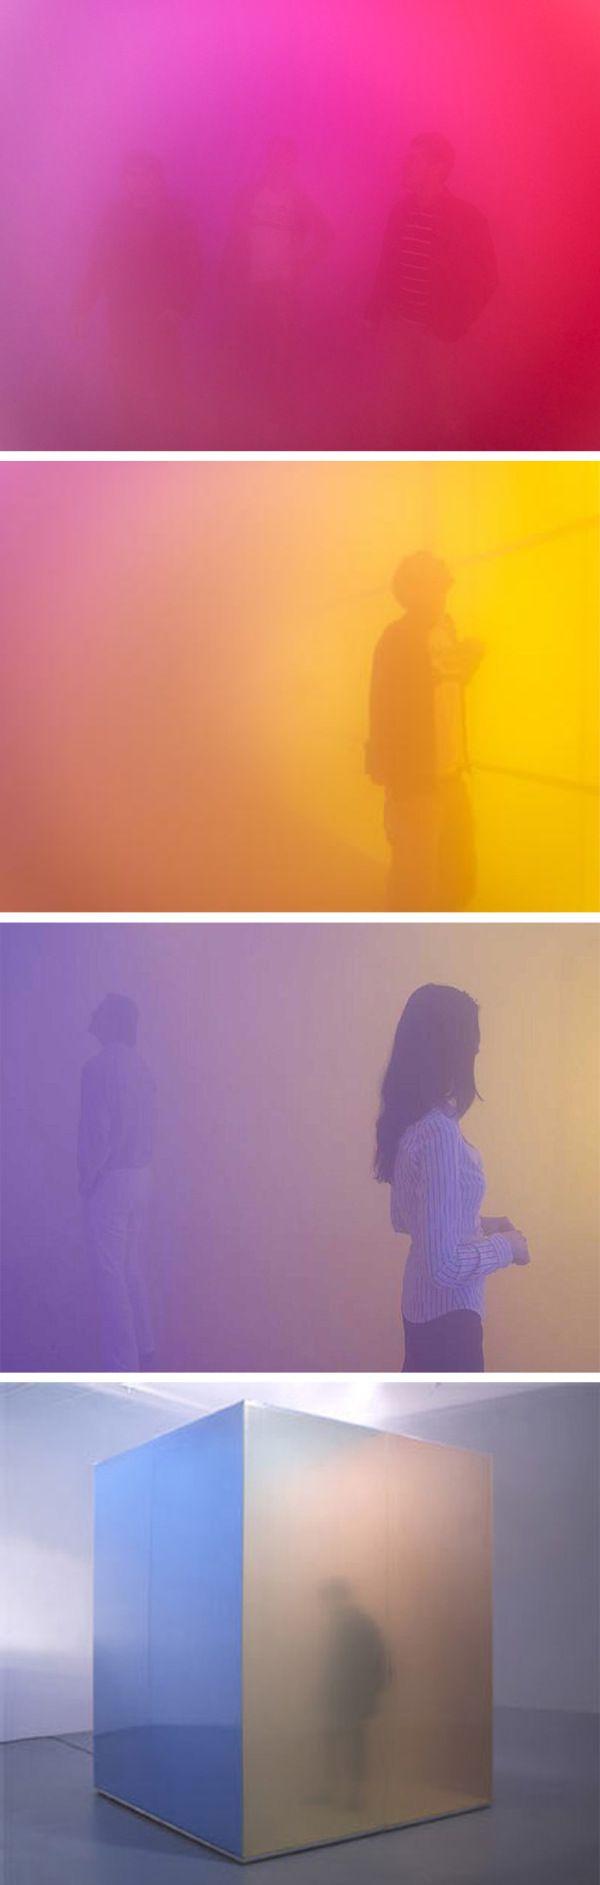 Ann Veronica Janssens #Perception CLLC. color, spectrum, fog, gradient, installation, #art, cube #installation